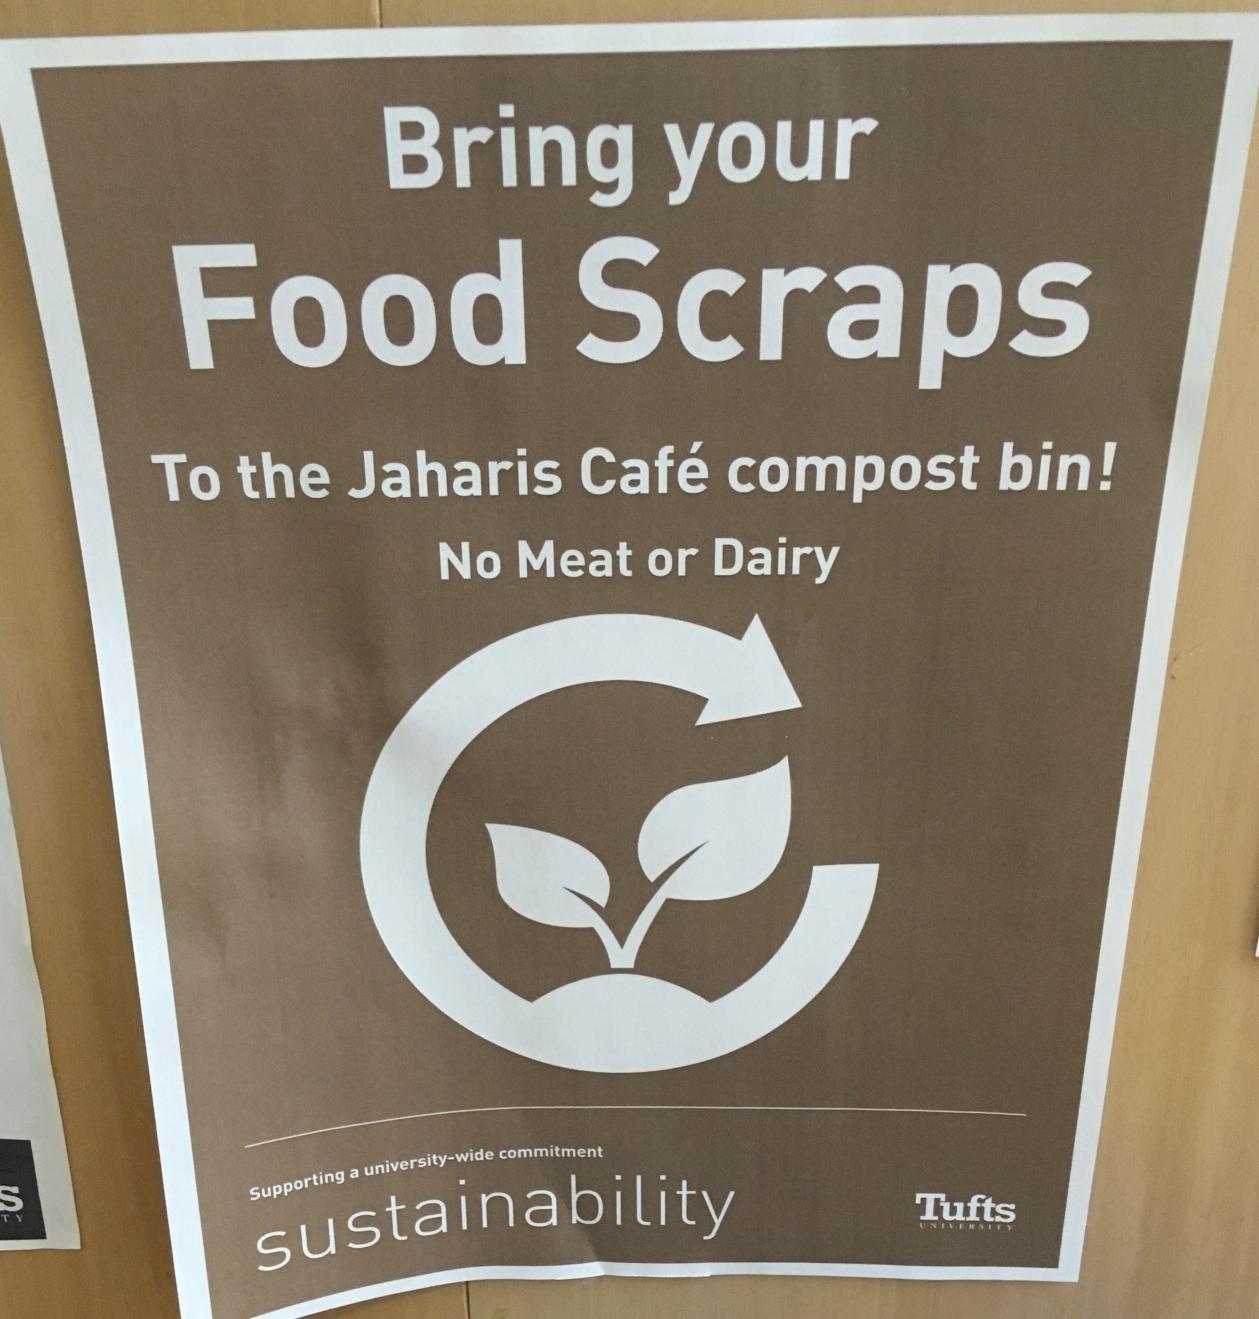 Composting Tufts Friedman School of Nutrition